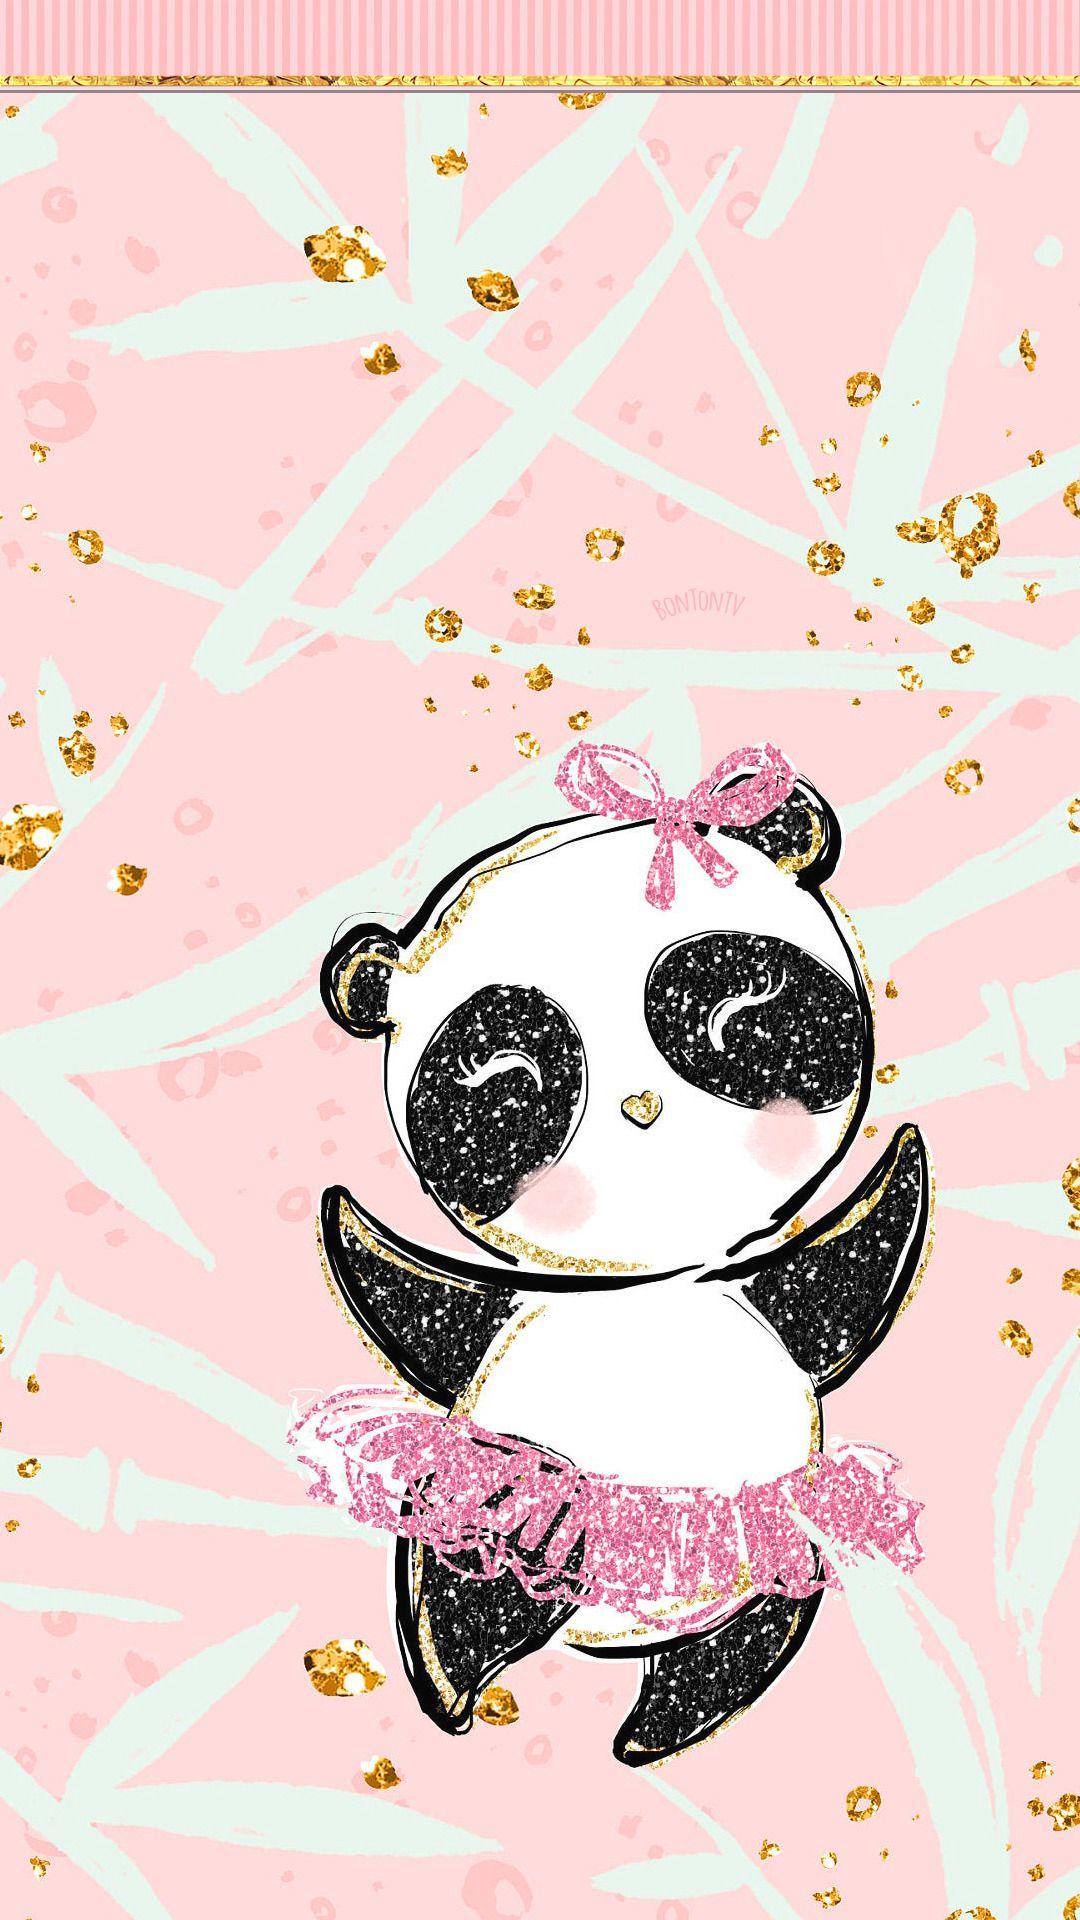 Cute Panda Wallpaper Mobile Best Hd Wallpapers Cute Panda Wallpaper Panda Background Cute Panda Cartoon